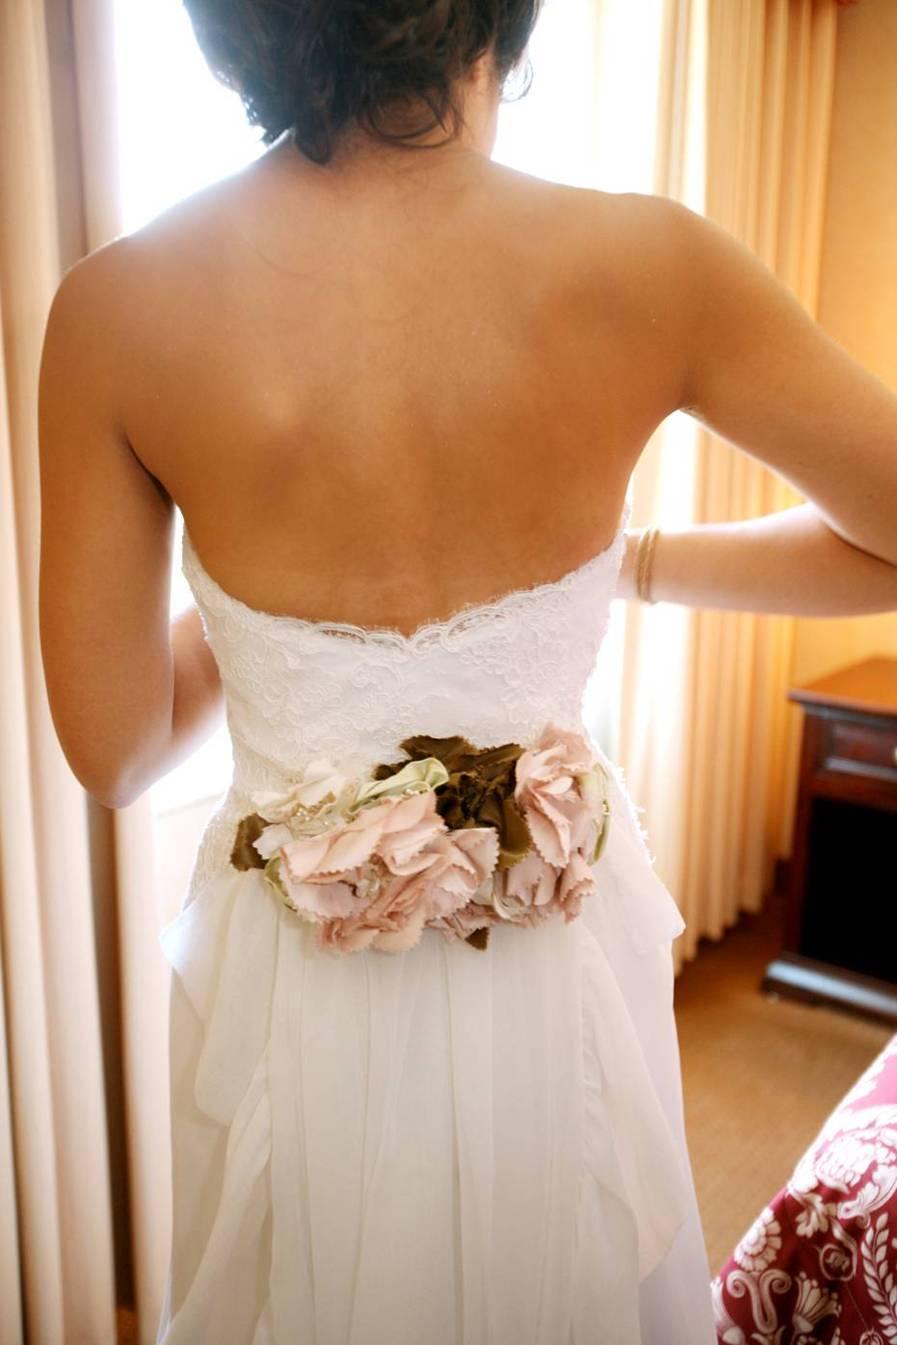 elizabeth dye gown with flowers